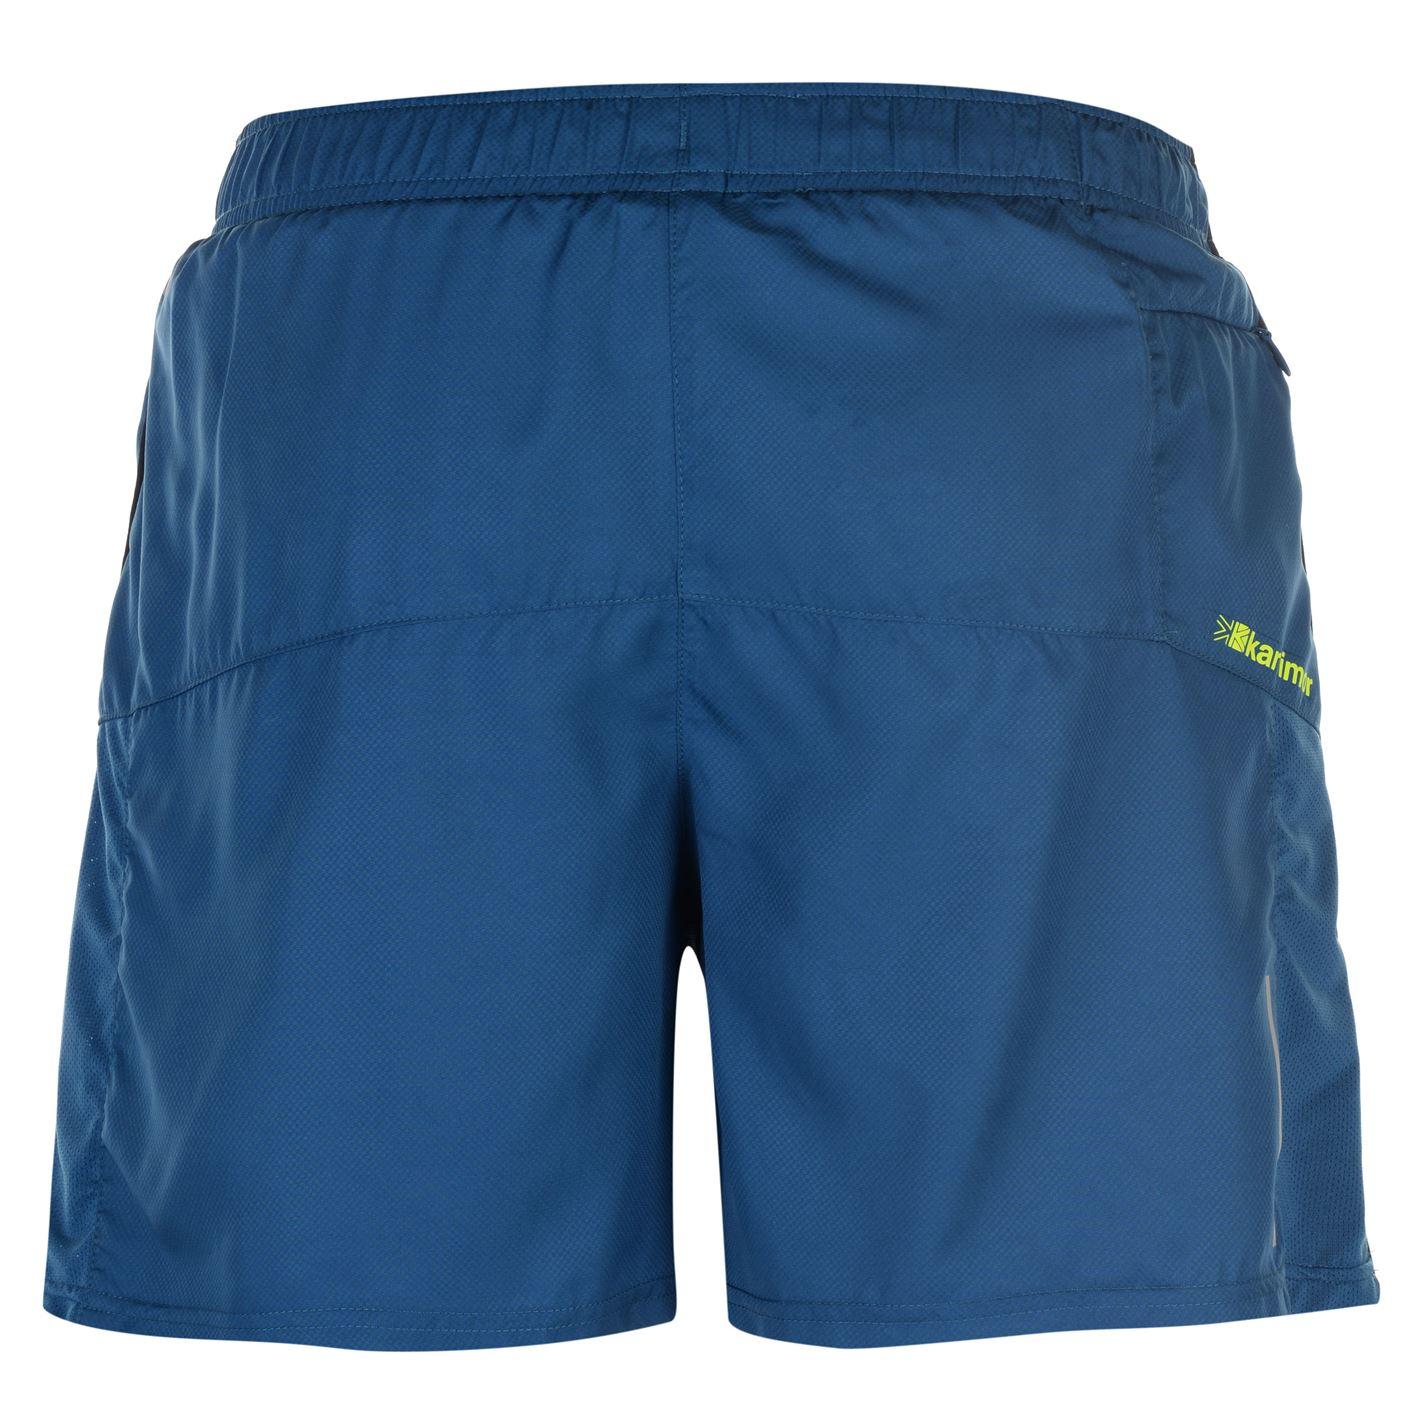 Karrimor-Xlite-5inch-Running-Shorts-Performance-Mens thumbnail 12